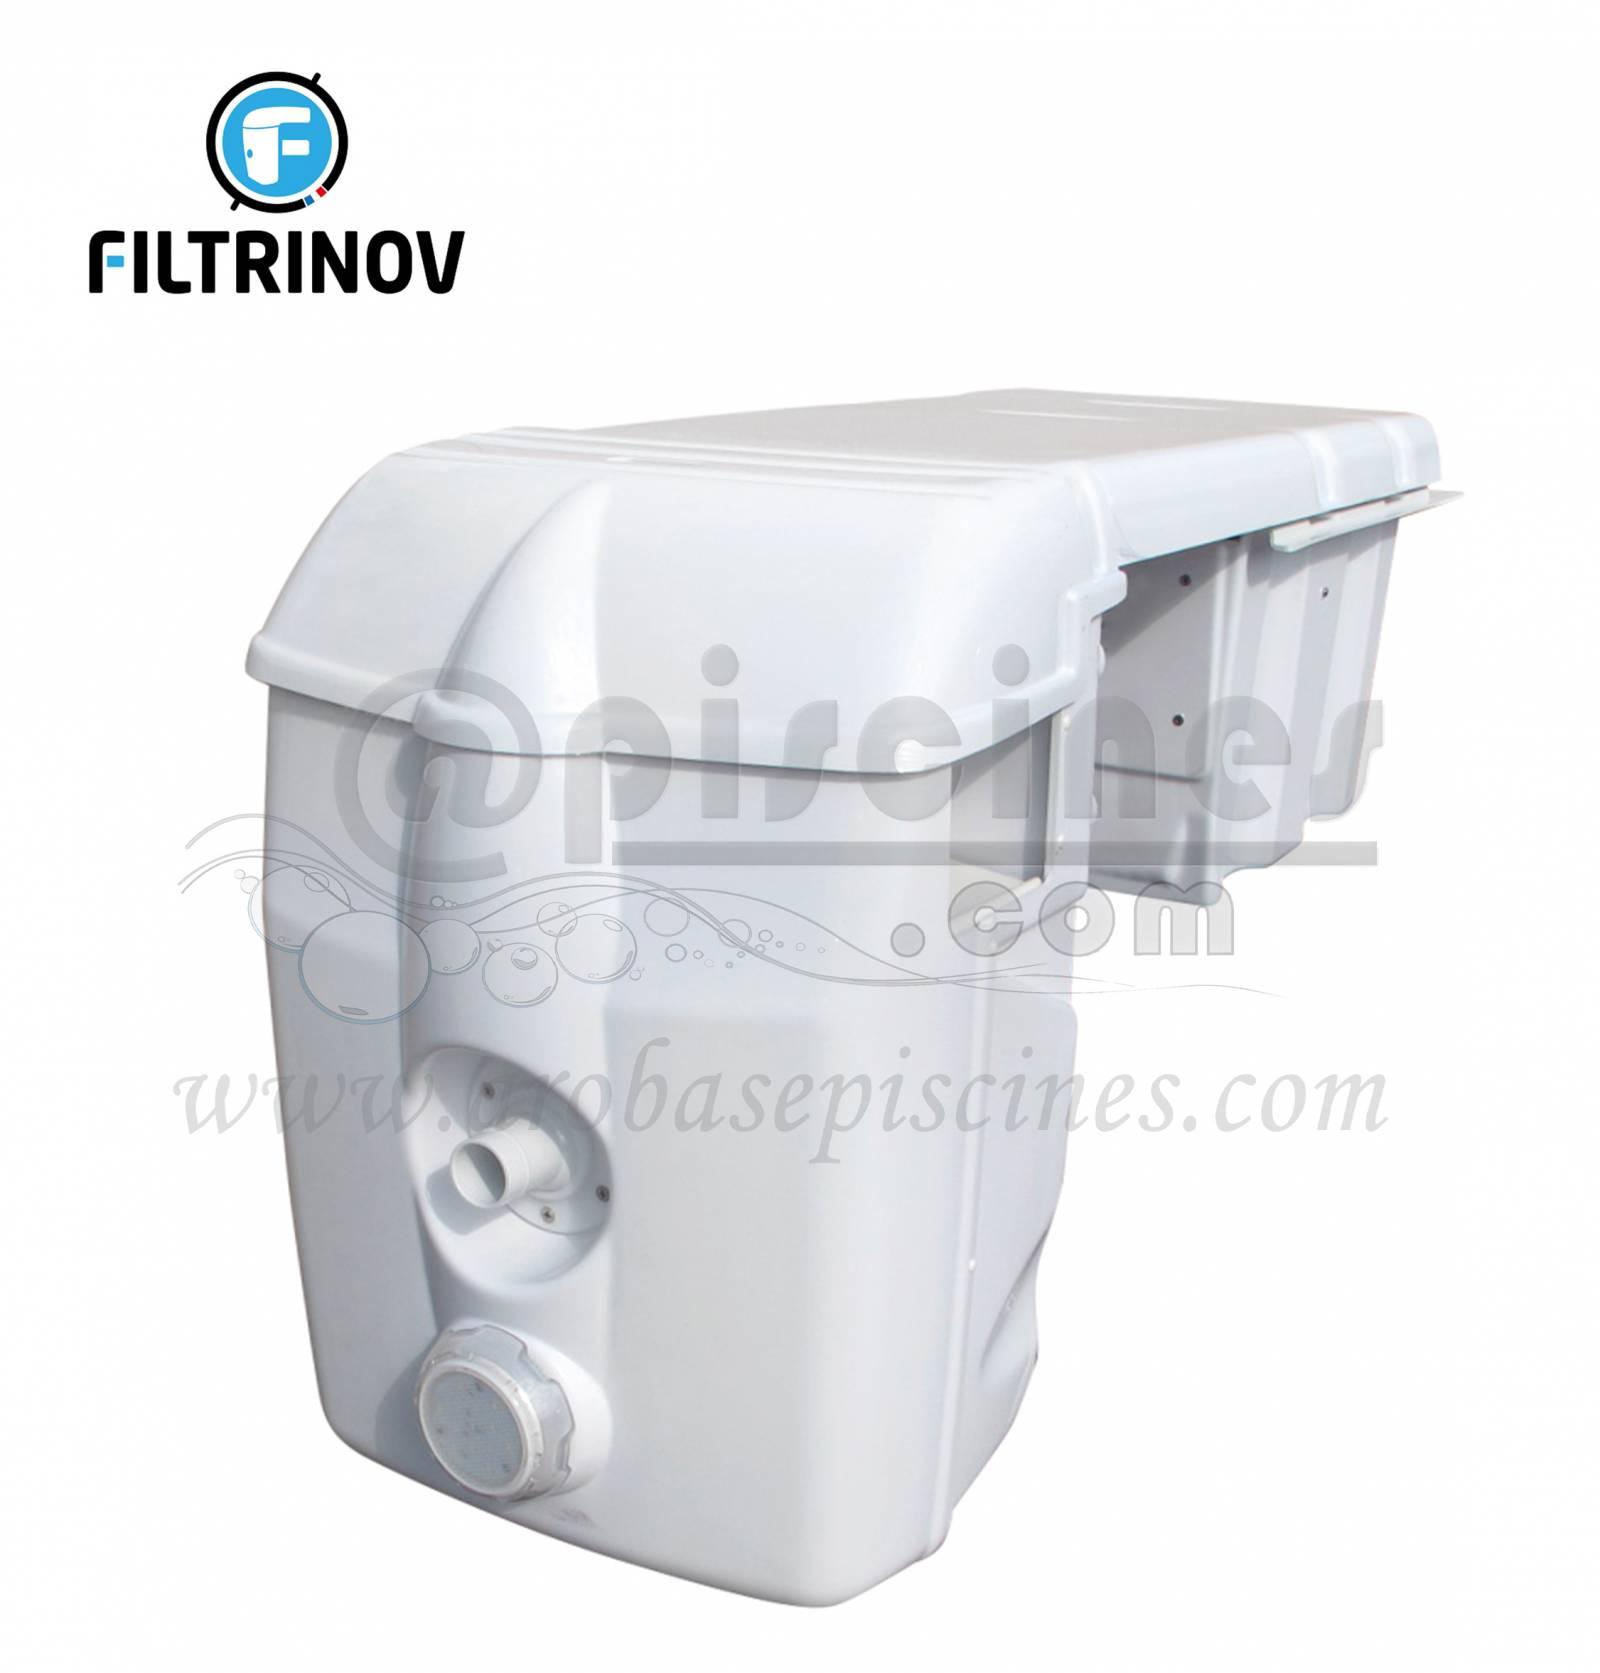 bloc filtrant filtrinov mx 18 avec by pass chauffage piscine en ligne arobase piscines. Black Bedroom Furniture Sets. Home Design Ideas